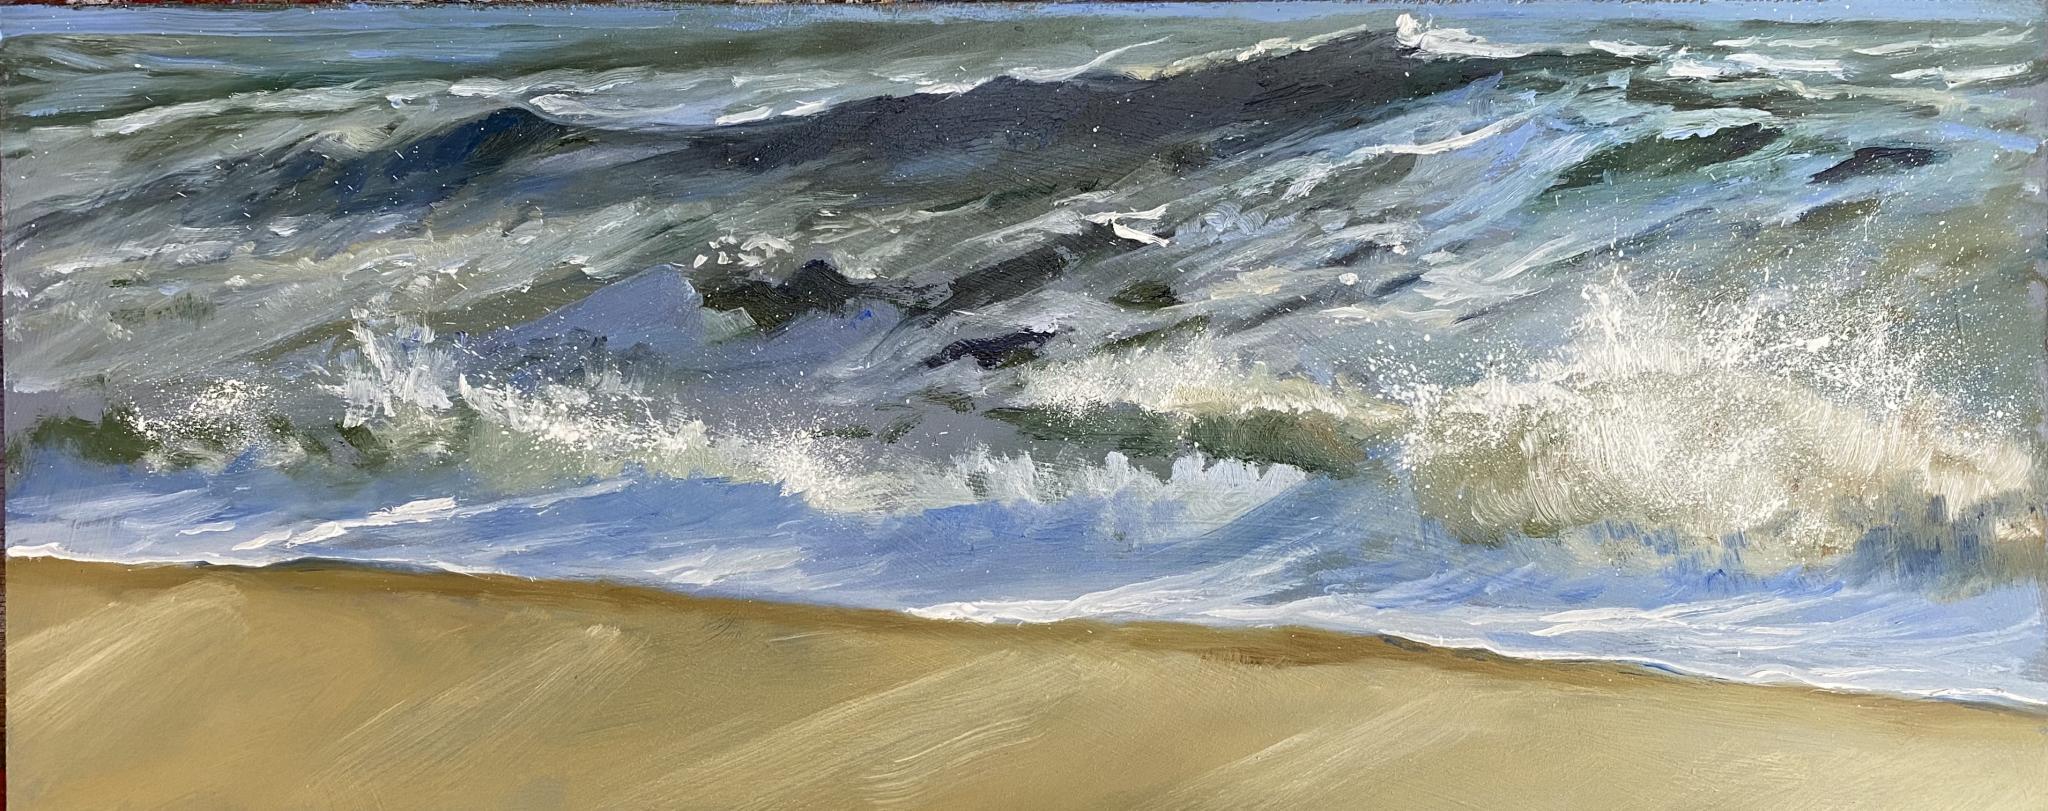 Post YOUR artwork here, cmon !!-43d40f26-9819-4c17-b8c4-54b9607f739c-jpg